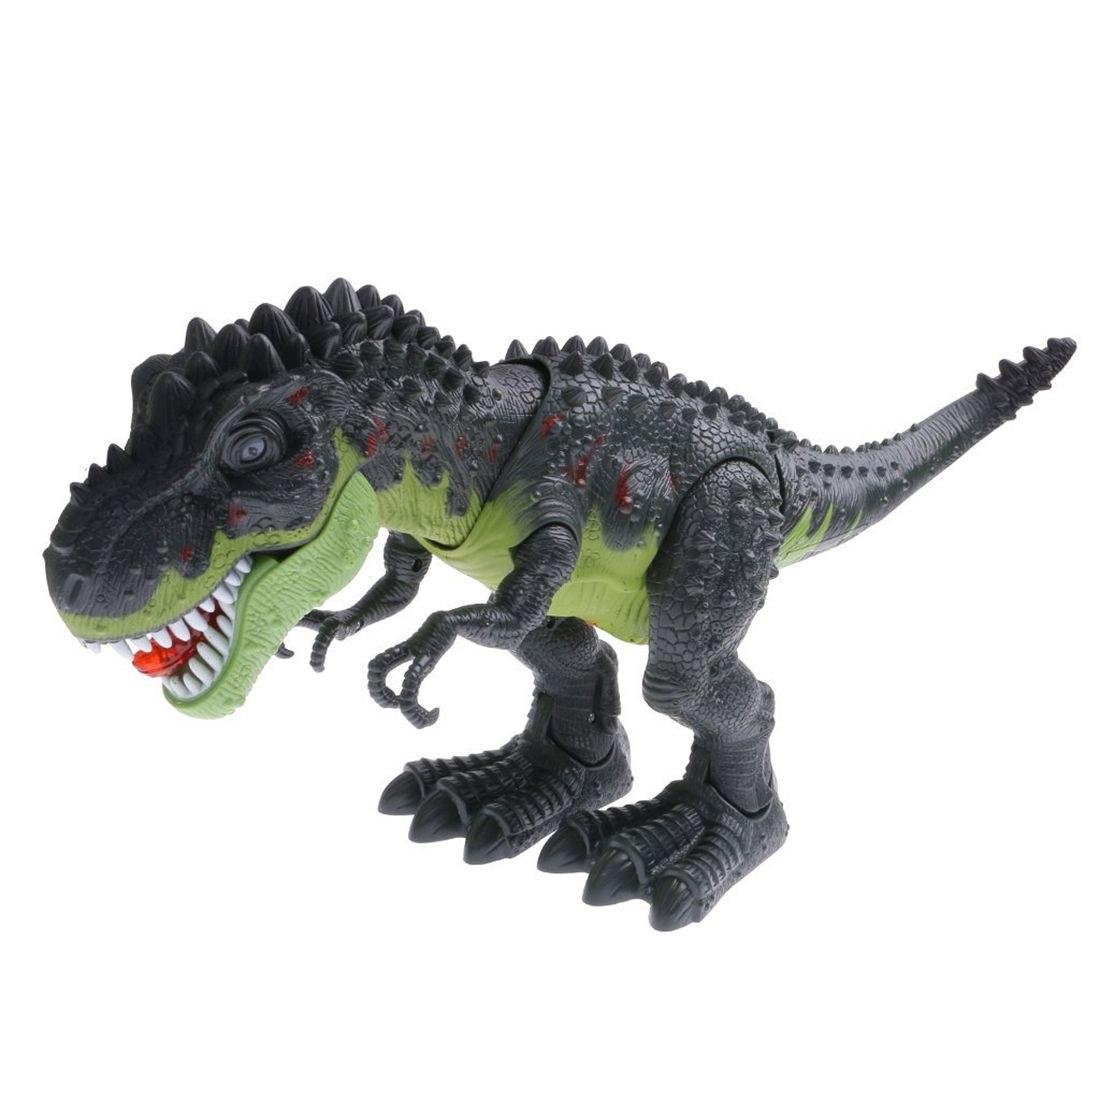 MALI-Cool Electric Walking Dinosaur Toy Robot W/ Sound Light Moving Kids Gift #2